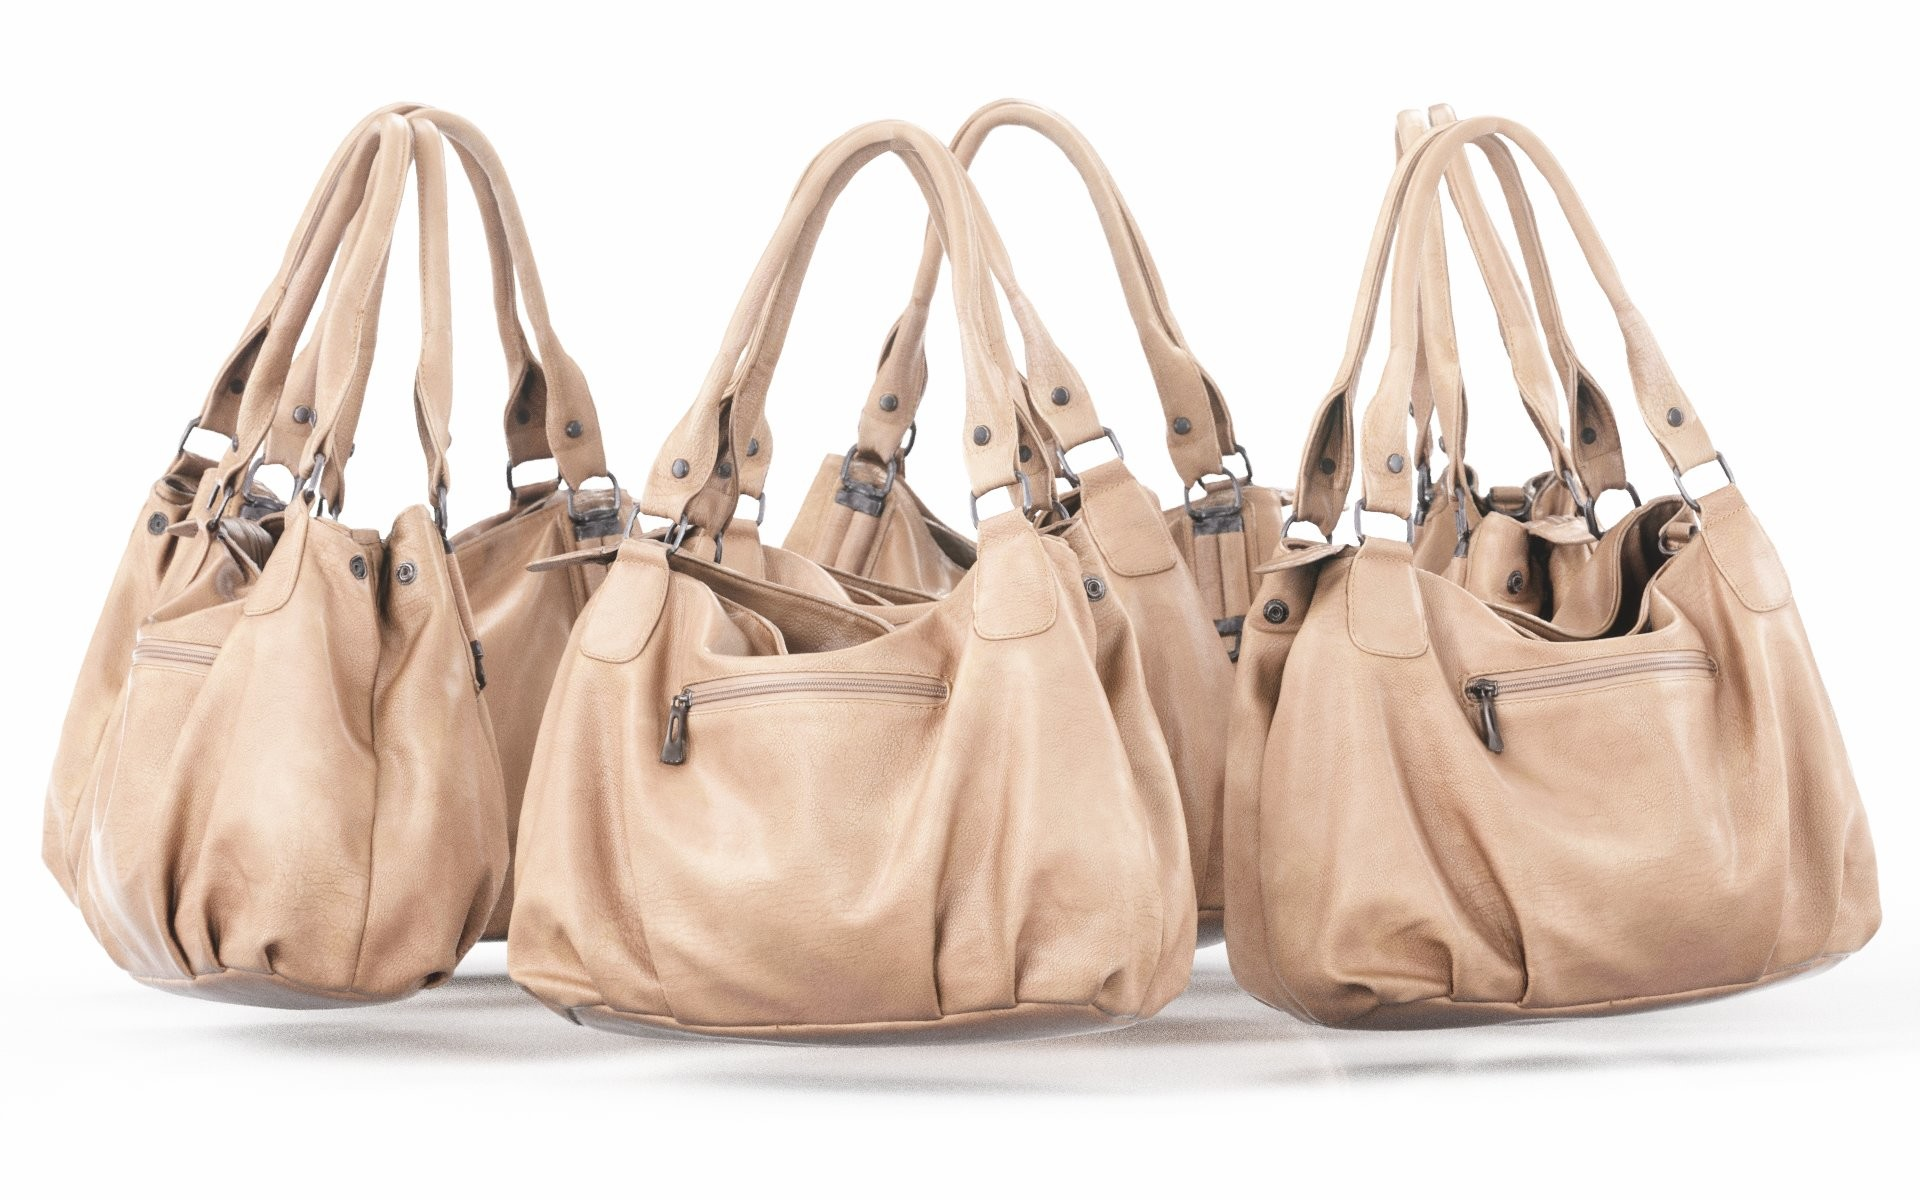 5343c6c4e2b9 https   www.cgtrader.com 3d-models character clothing light-brown-leather- handbag